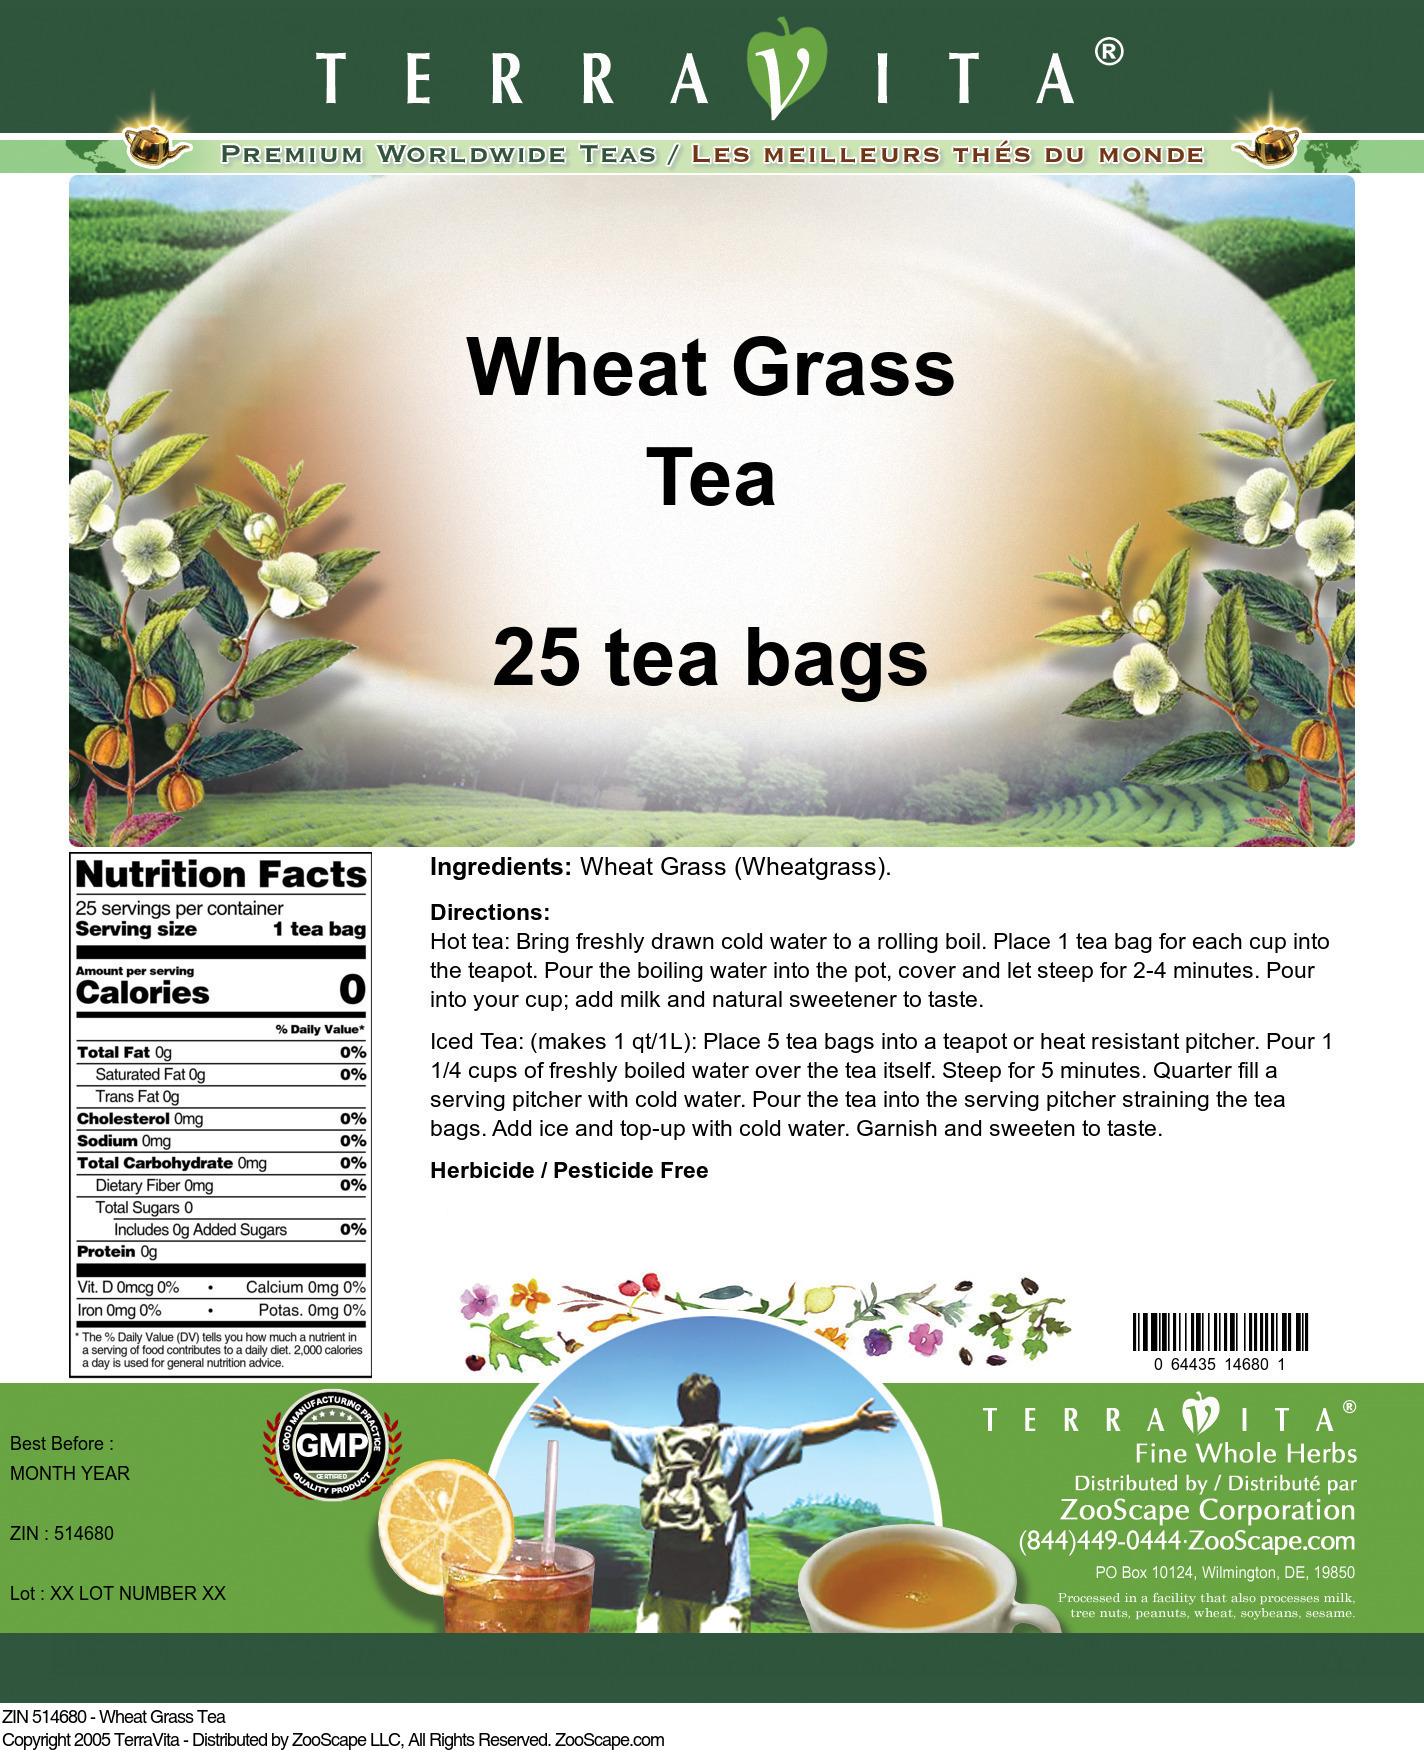 Wheat Grass Tea